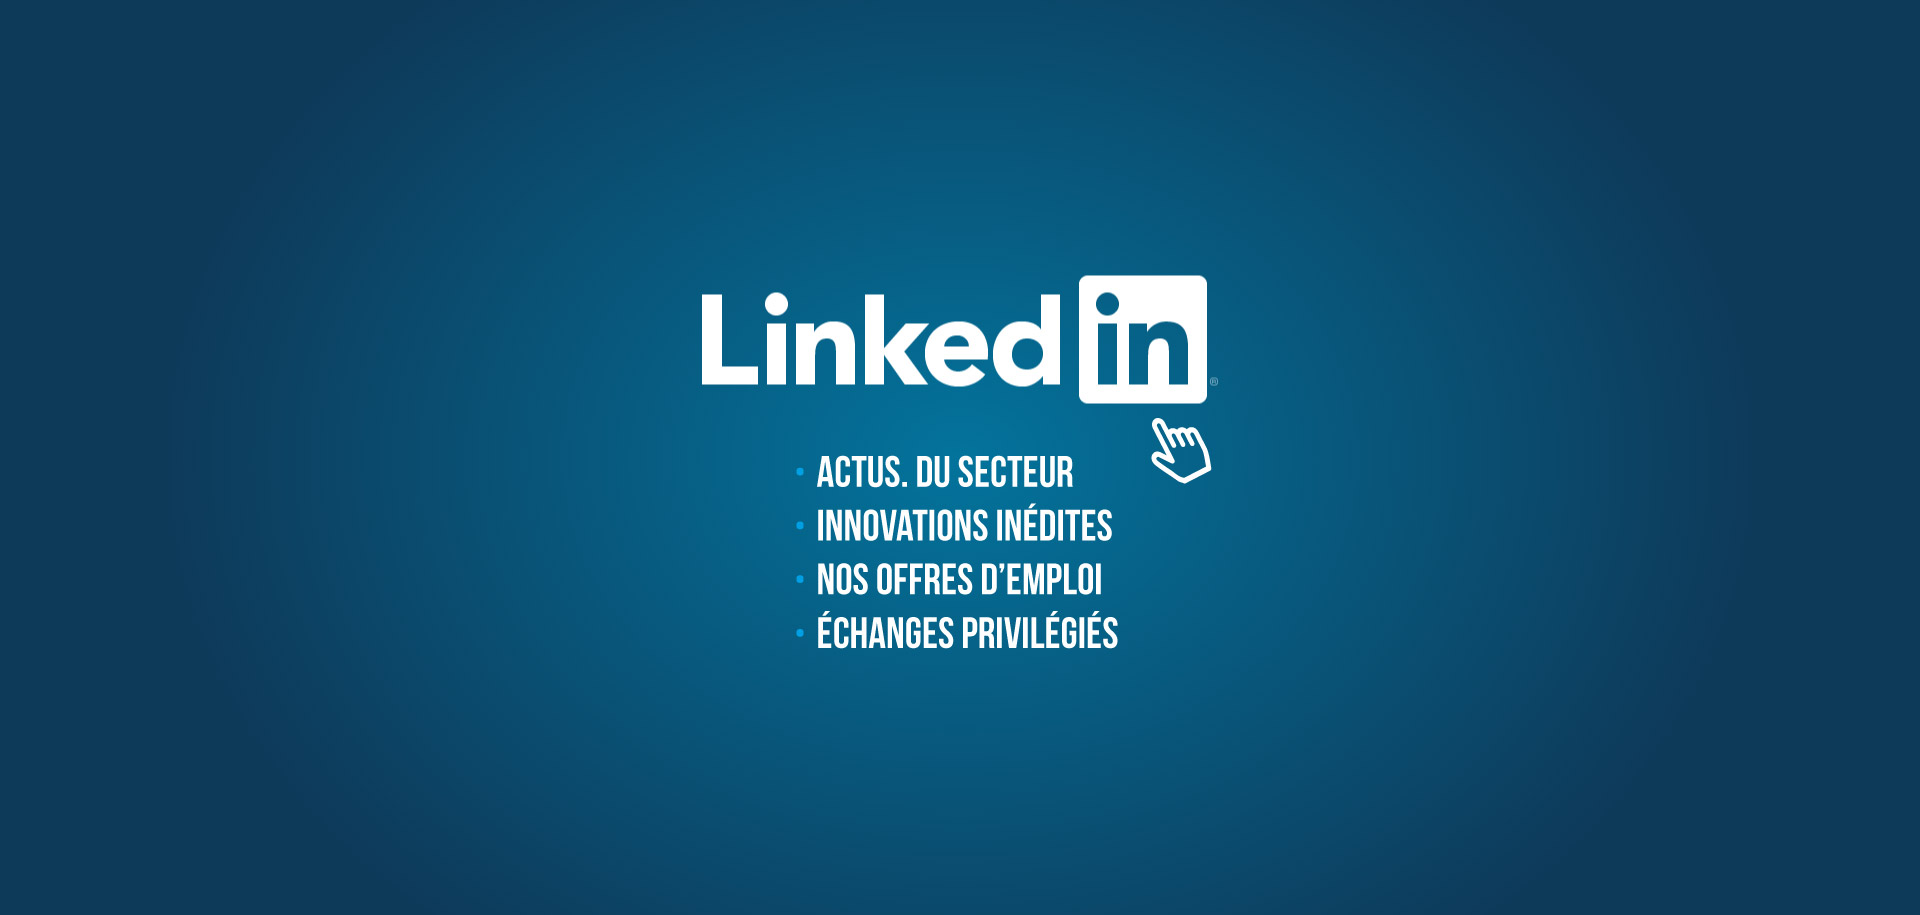 Nouvelle page LinkedIn